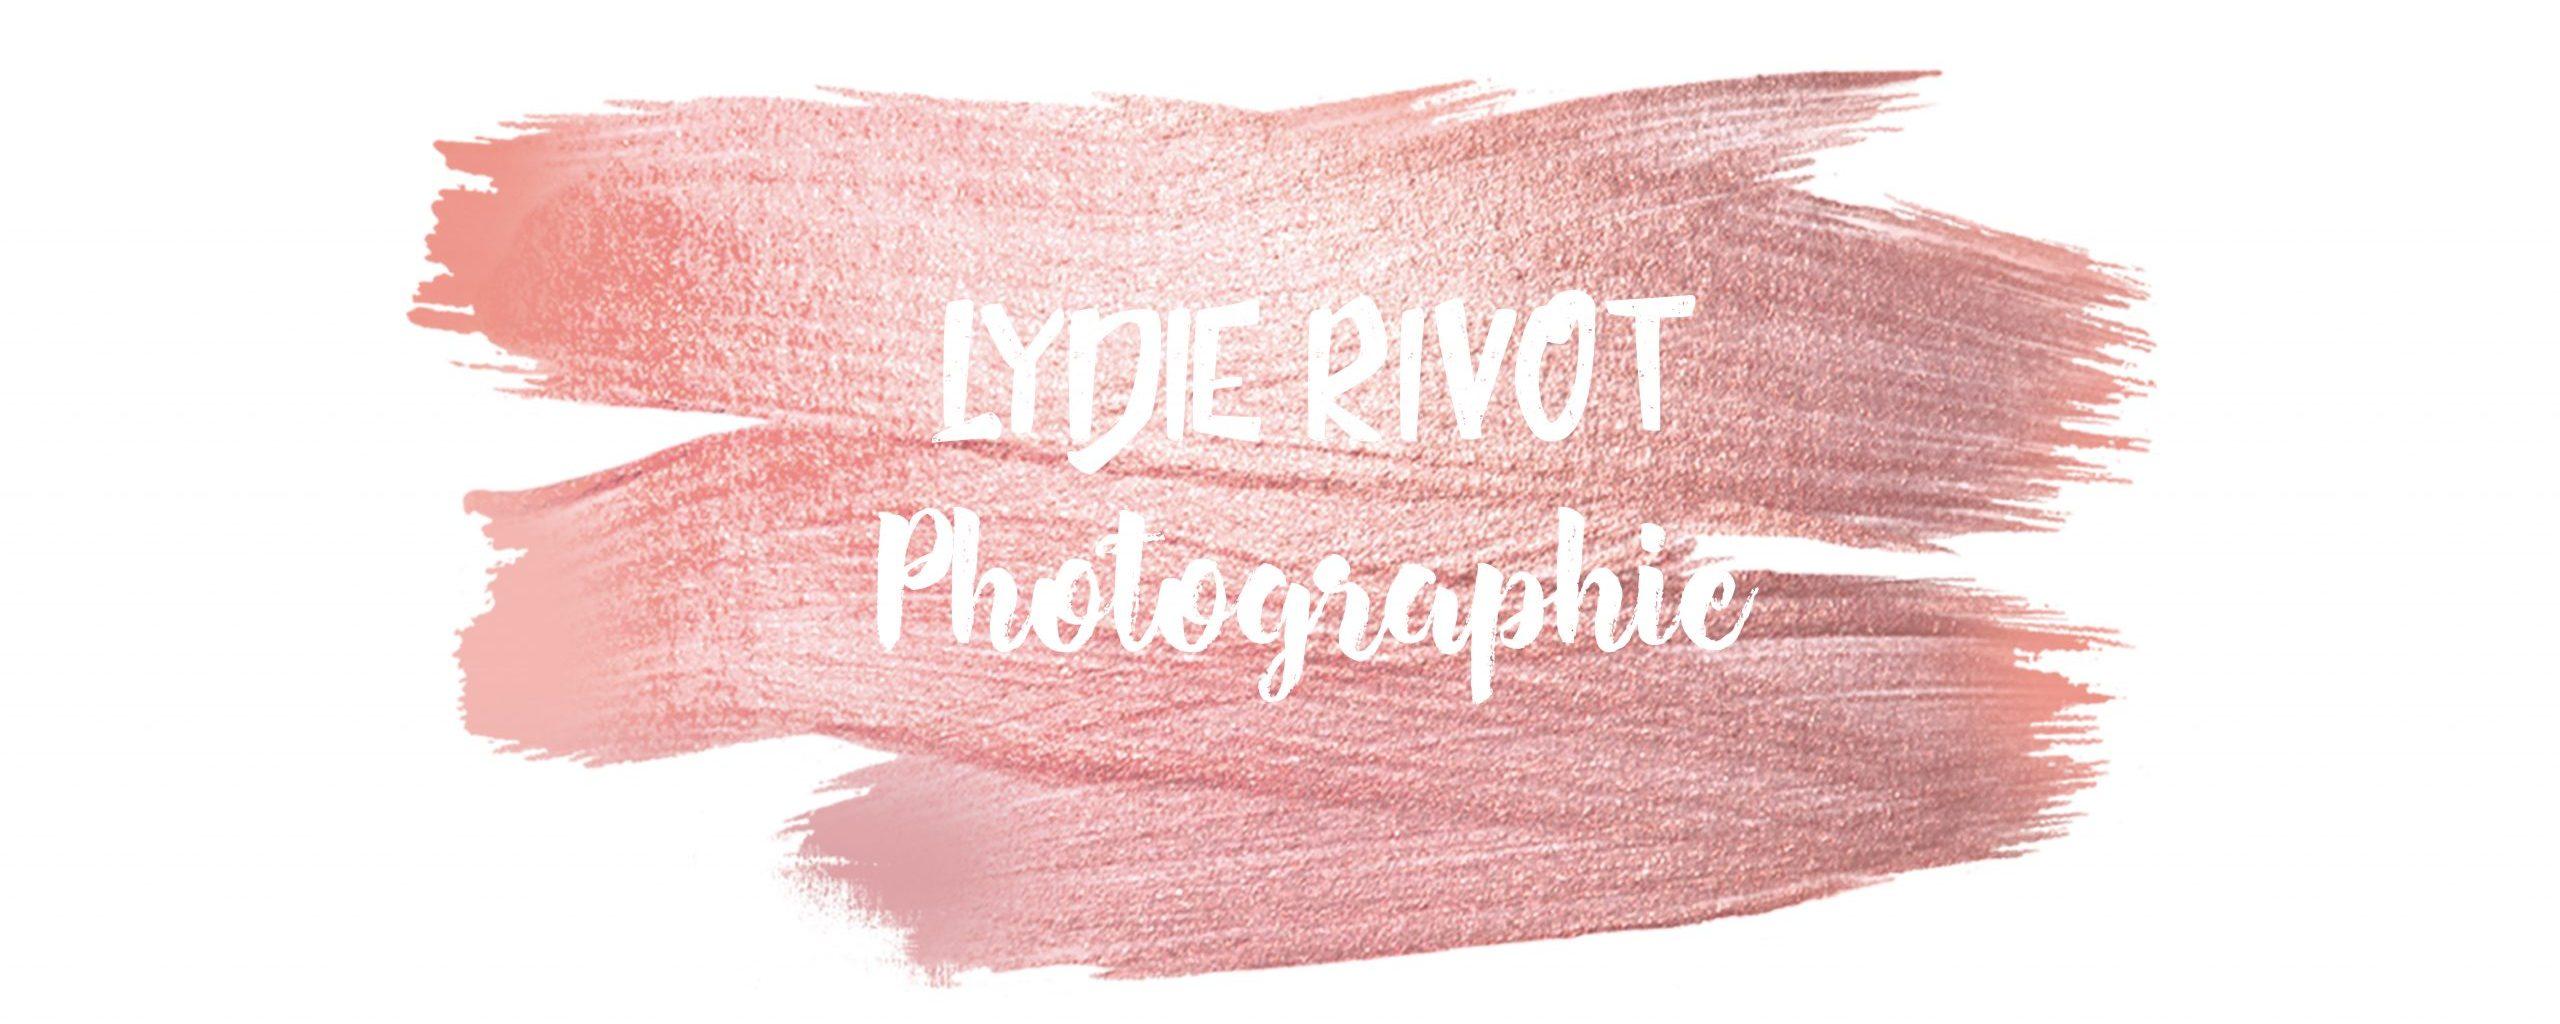 Logo for Lydie Rivot